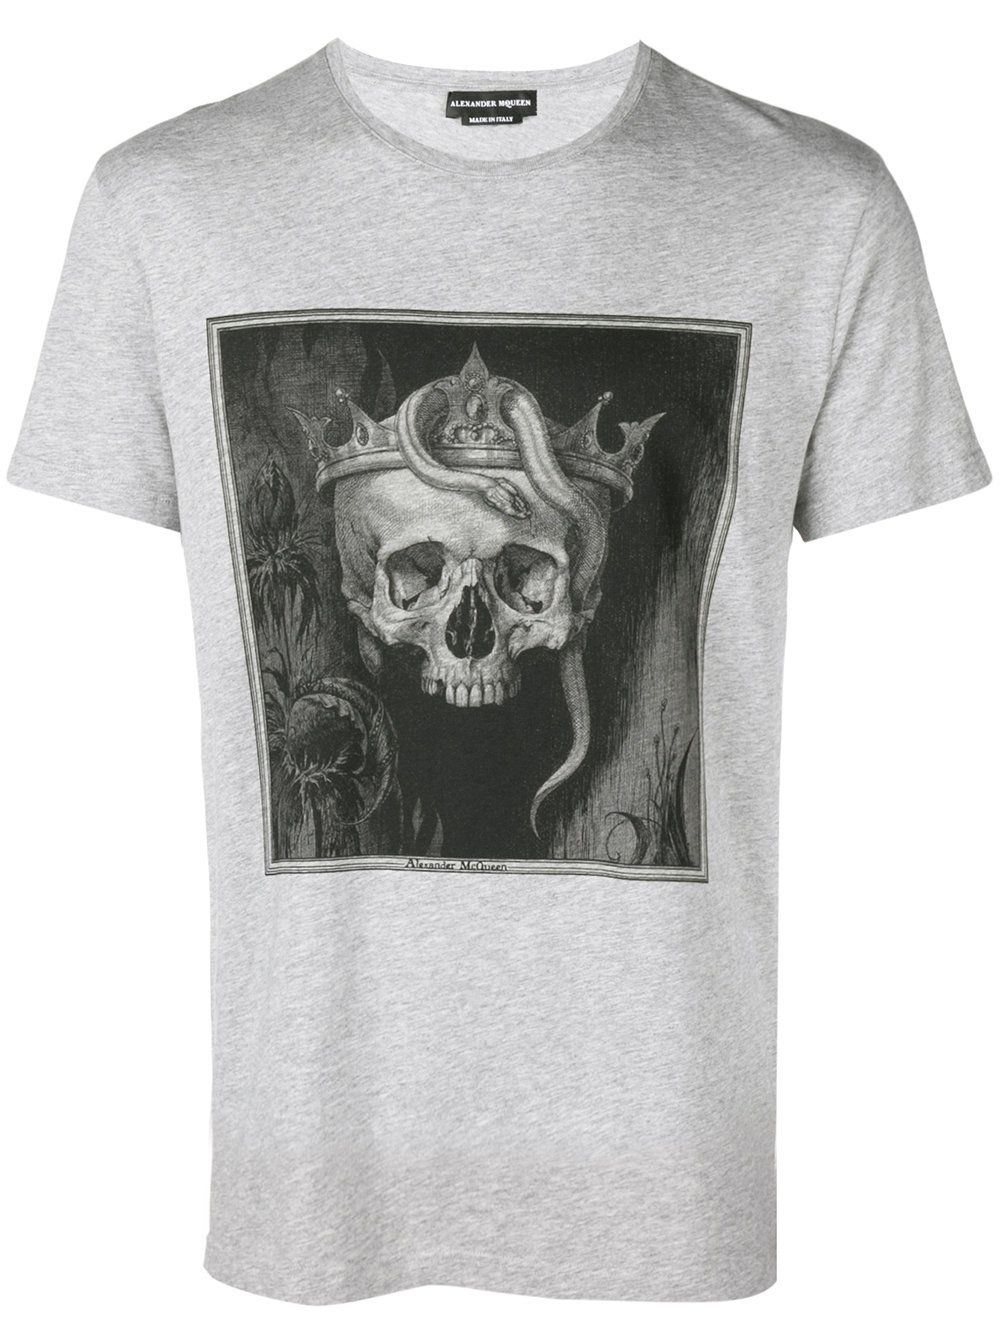 dcafdaa2 Alexander McQueen Crowned Skull T-shirt | T-shirts | Shirts, T shirt ...